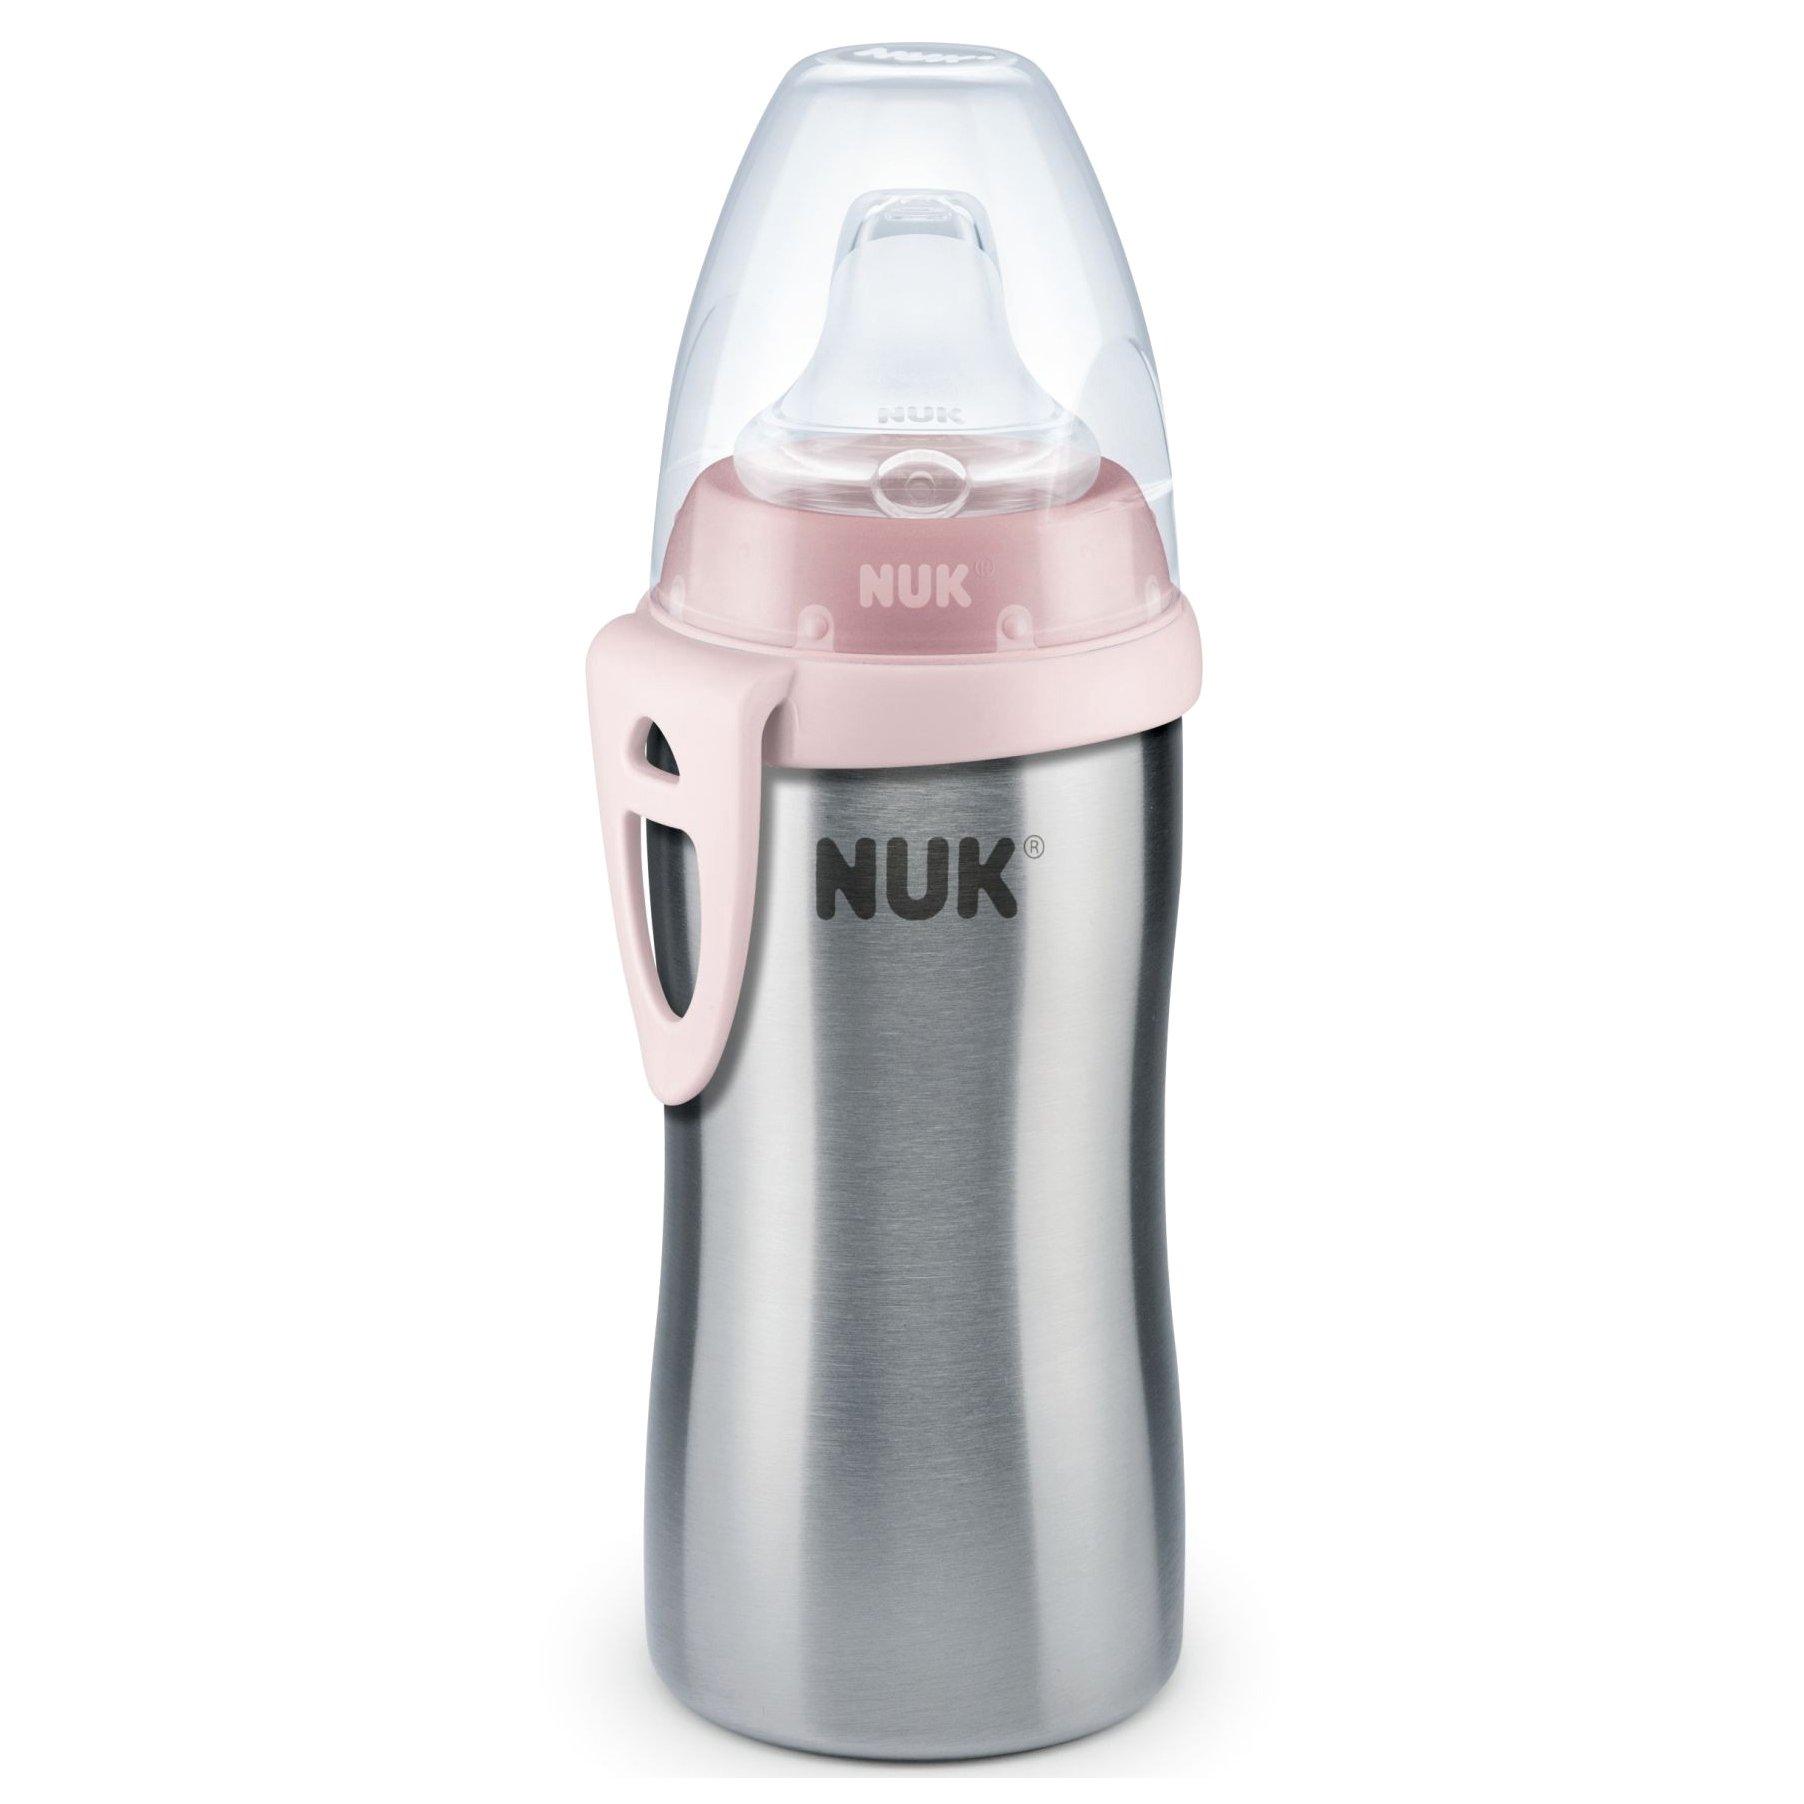 Nuk Kiddy Cup PP Παγουράκι Από Ανοξείδωτο Ατσάλι με Ρύγχος & Κλιπ 12m+ , 300ml – ροζ